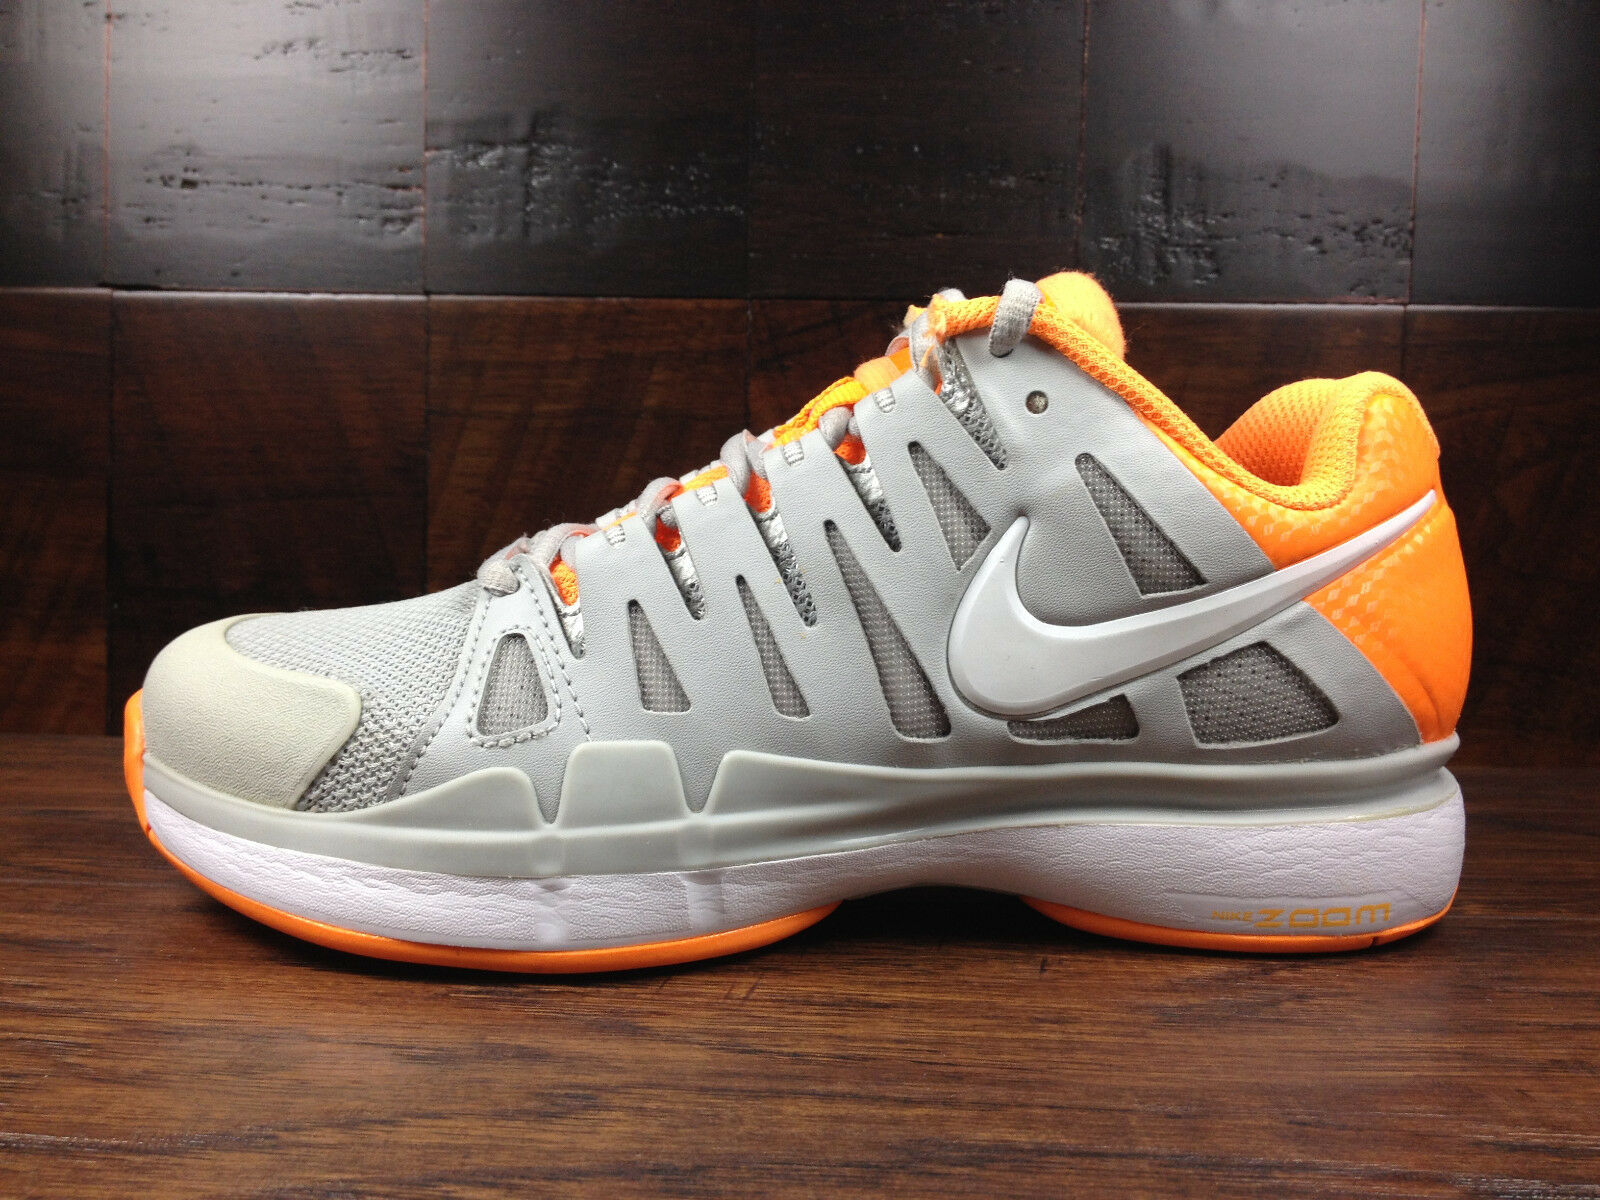 Nike Zoom Vapor 9 Tour Sharapova Price reduction Tennis Price reduction Womens Comfortable and good-looking